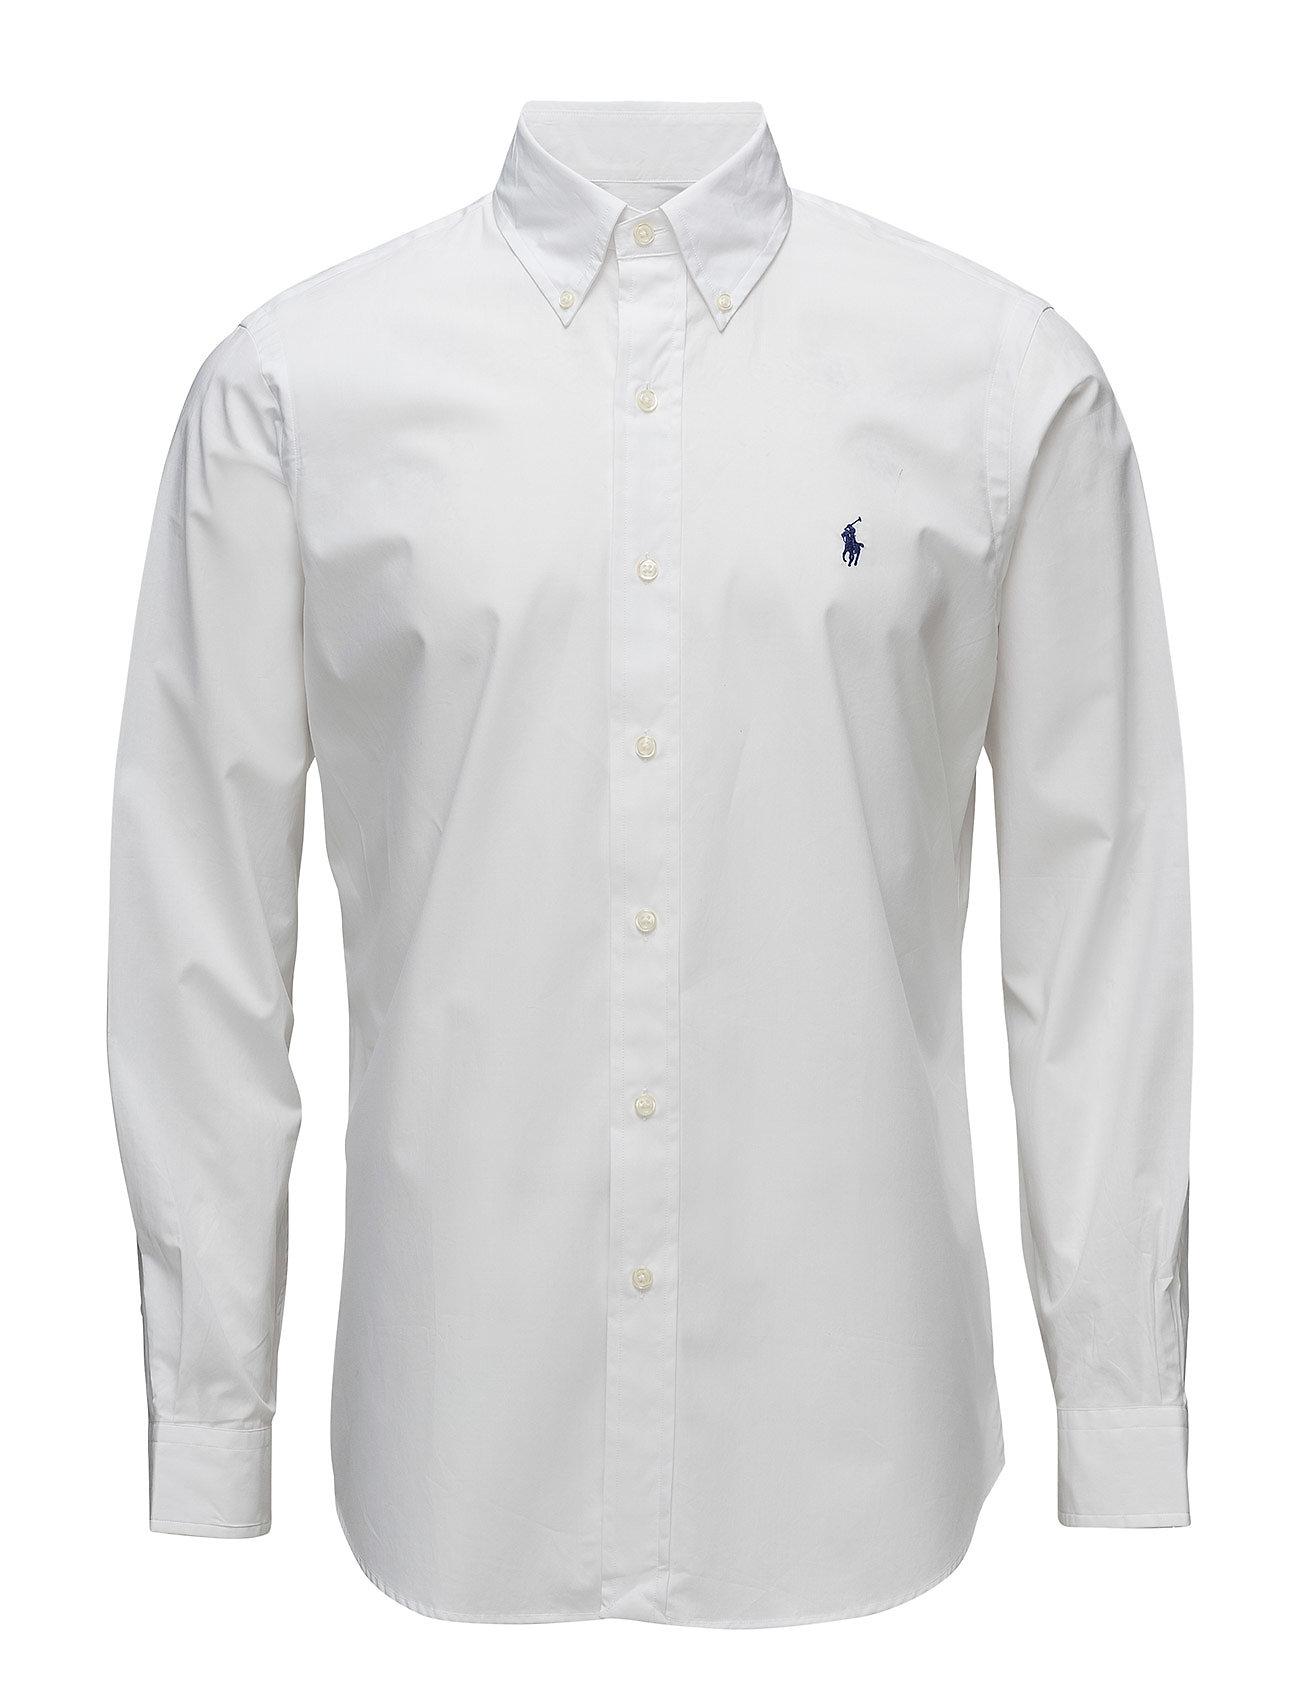 Polo Ralph Lauren BD PPC SPT-LONG SLEEVE-SPORT SHIRT - WHITE